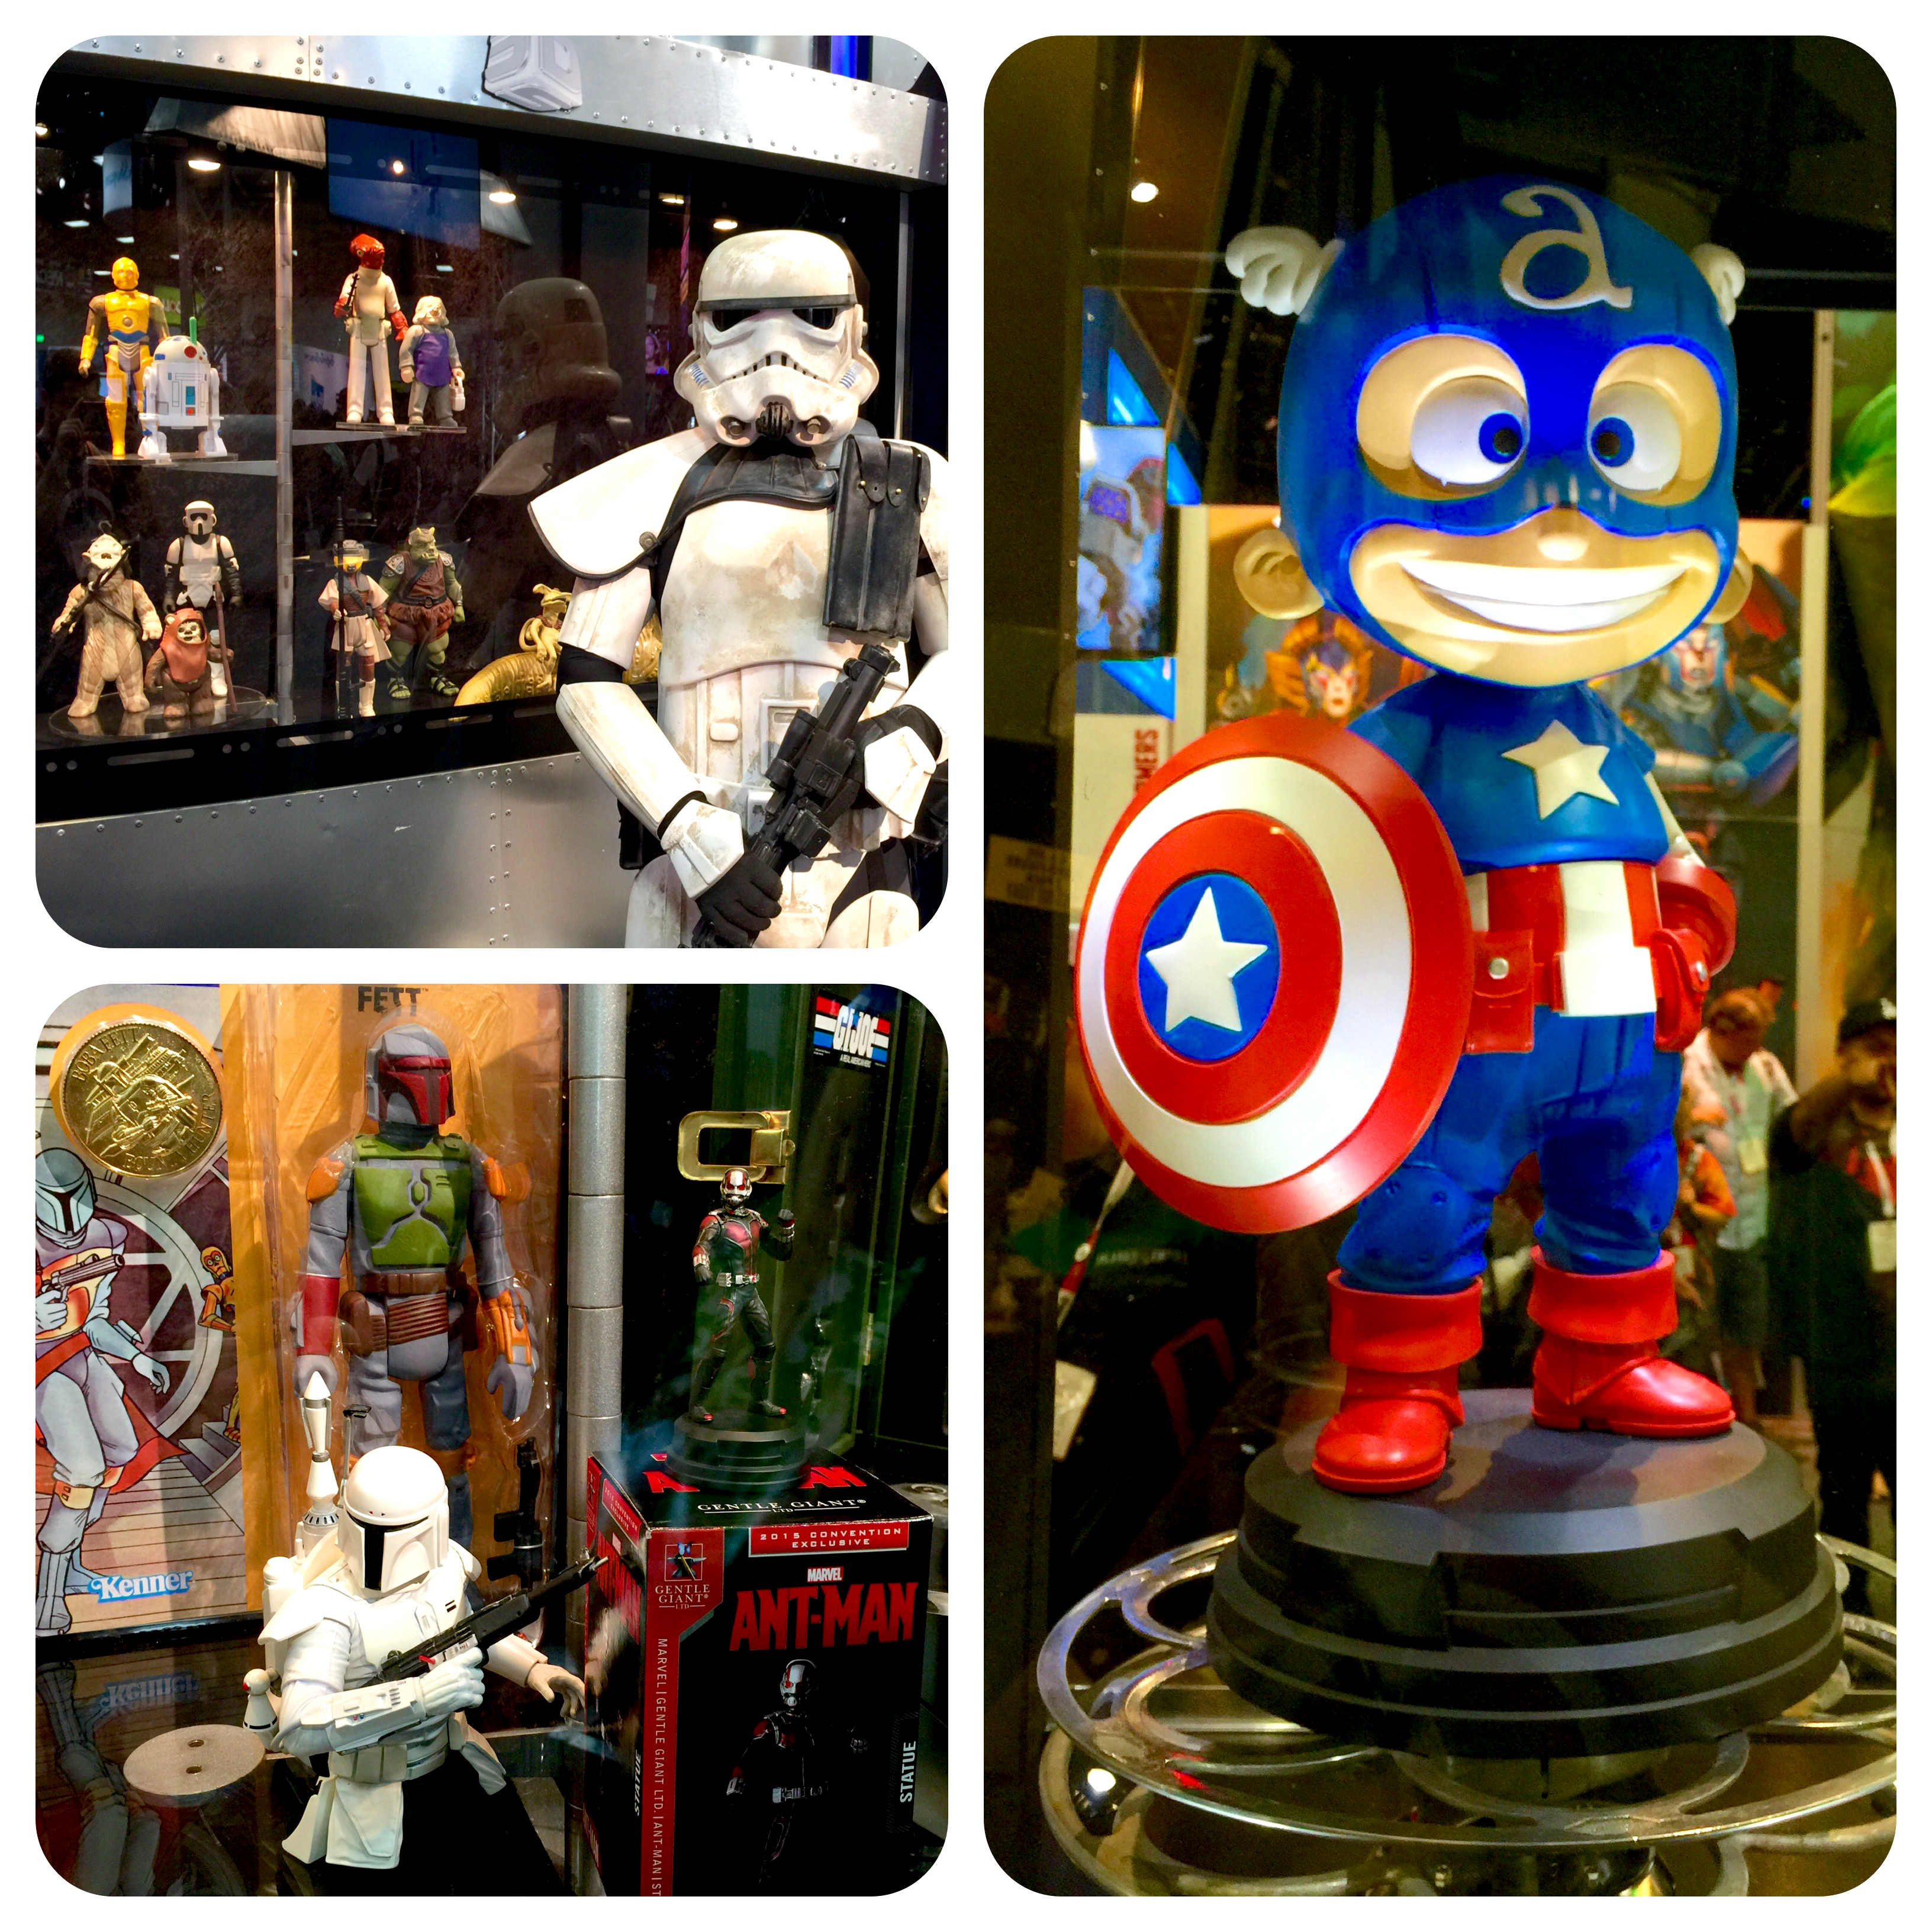 [Evento][Tópico Oficial] Comic-Con San Diego 2015 - Cobertura e itens exclusivos! - Página 4 8OmwzR